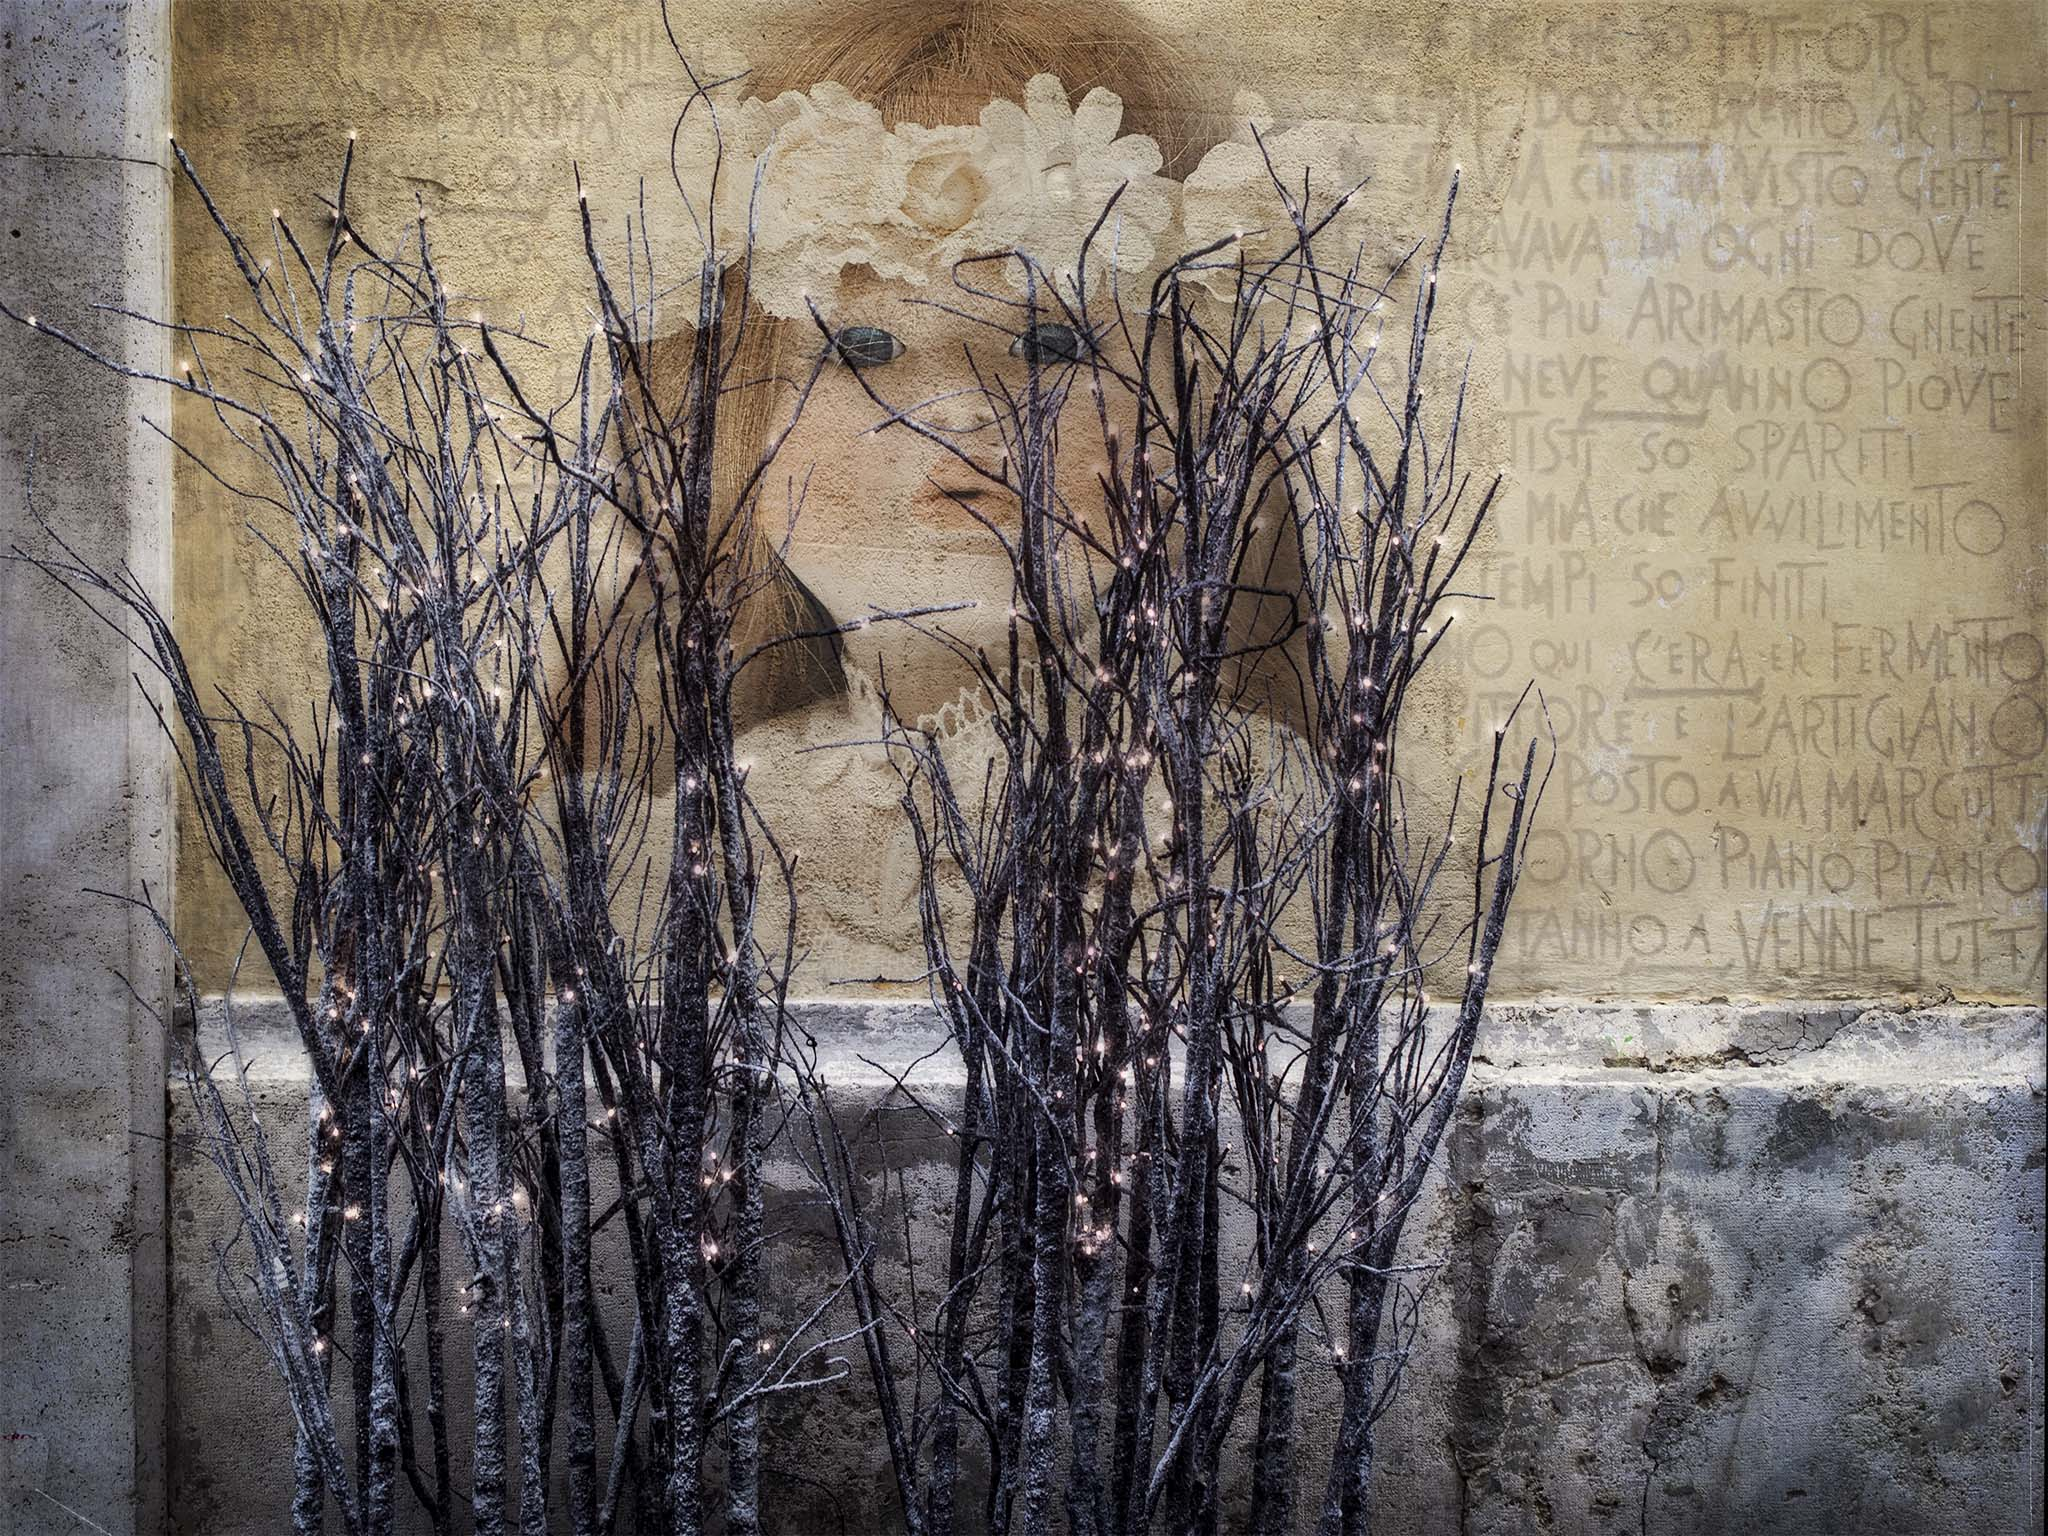 Melinda Isachsen JANIS Photography & Fine Art Rome Italy Italia via Margutta